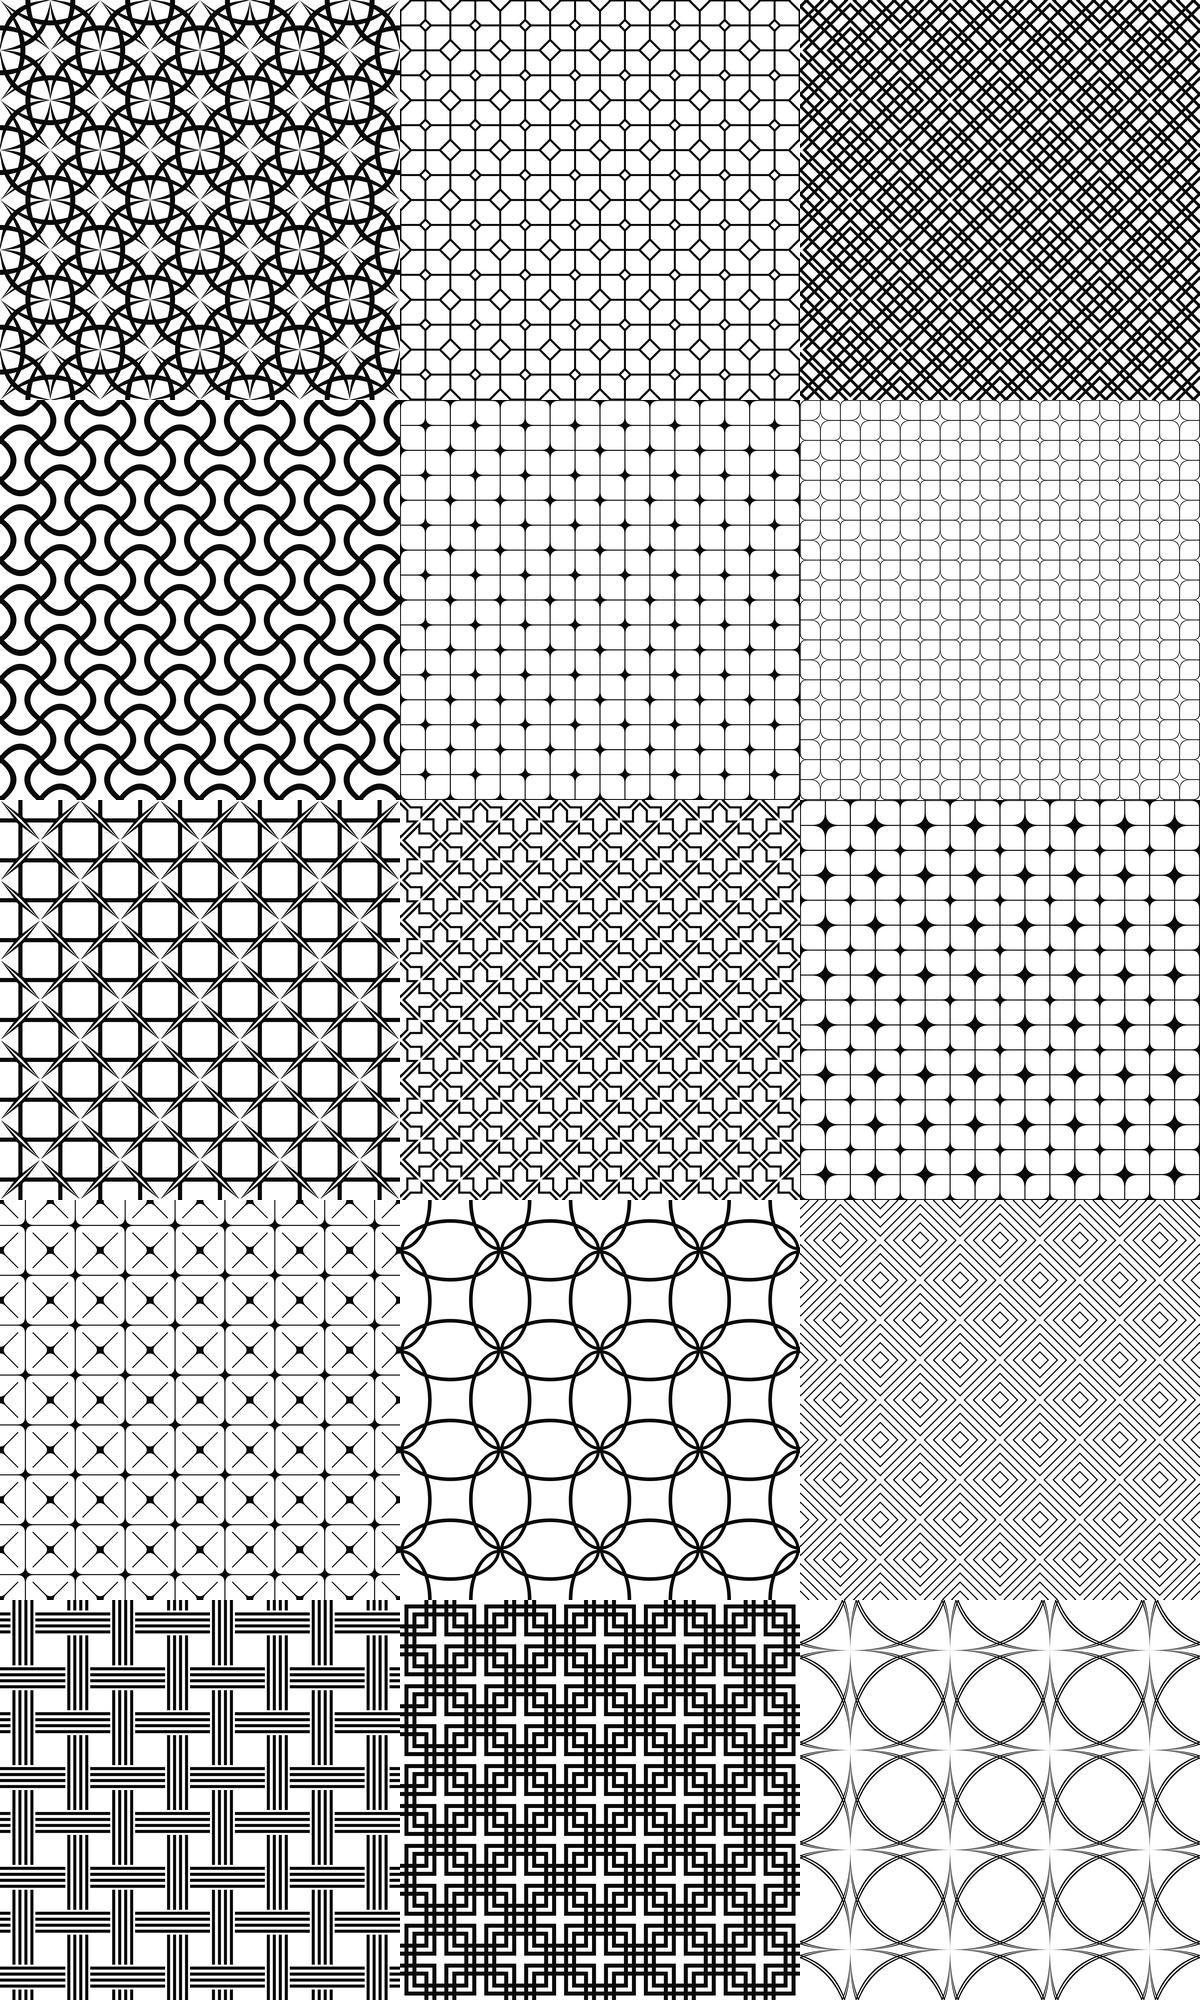 90 Vector Grid Patterns Black And White Pattern Background Collection Eps Jpg Geometric Pattern Design Monochrome Pattern Zentangle Patterns